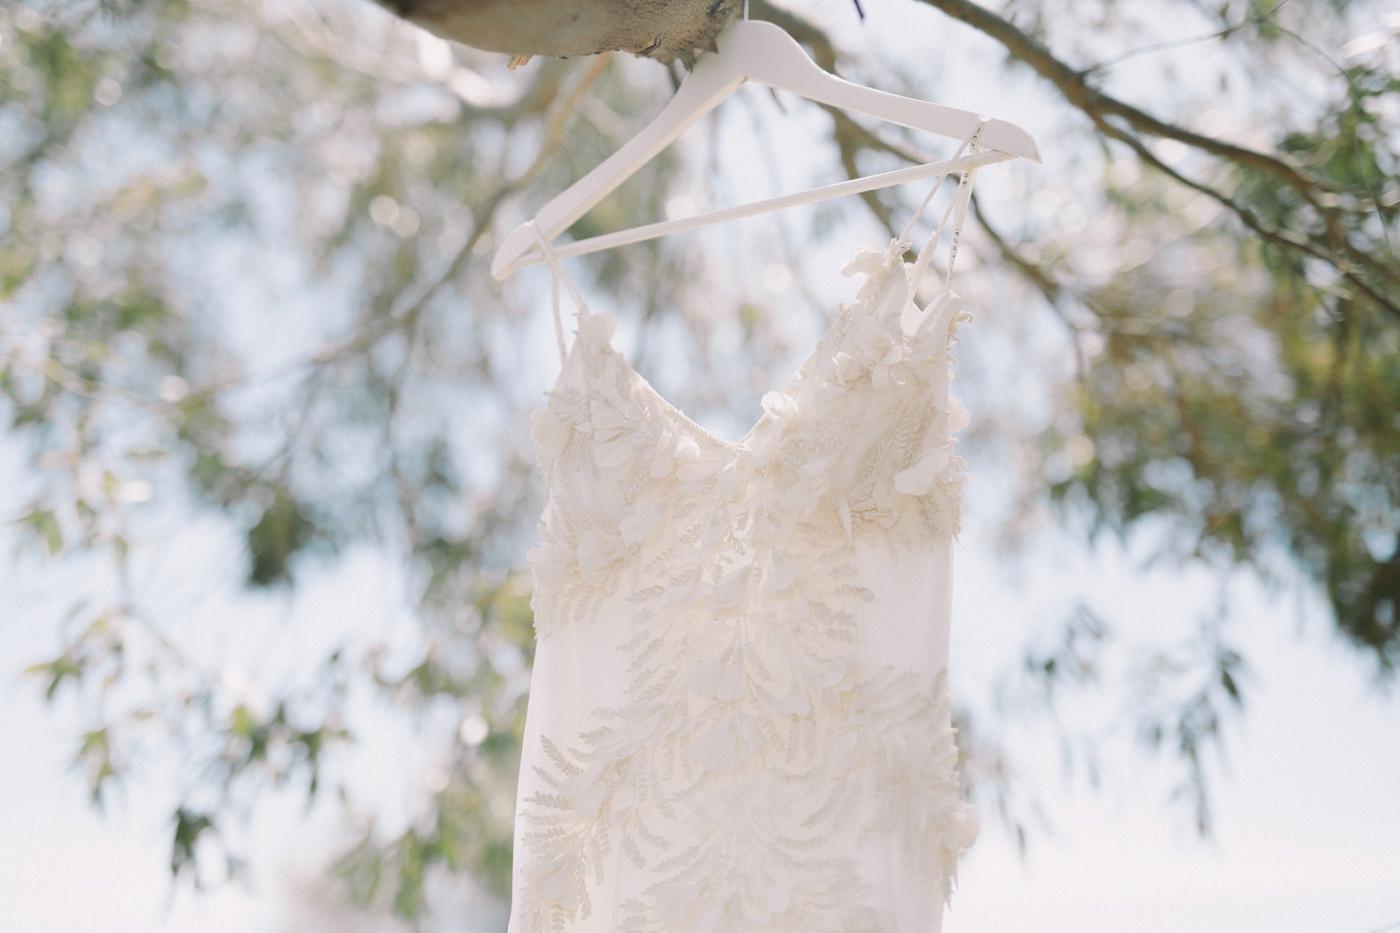 Maddy & Wes - K1 by Geoff Hardy Wedding - Adelaide Wedding Photographer - Natural wedding photography in Adelaide - Katherine Schultz_0003.jpg